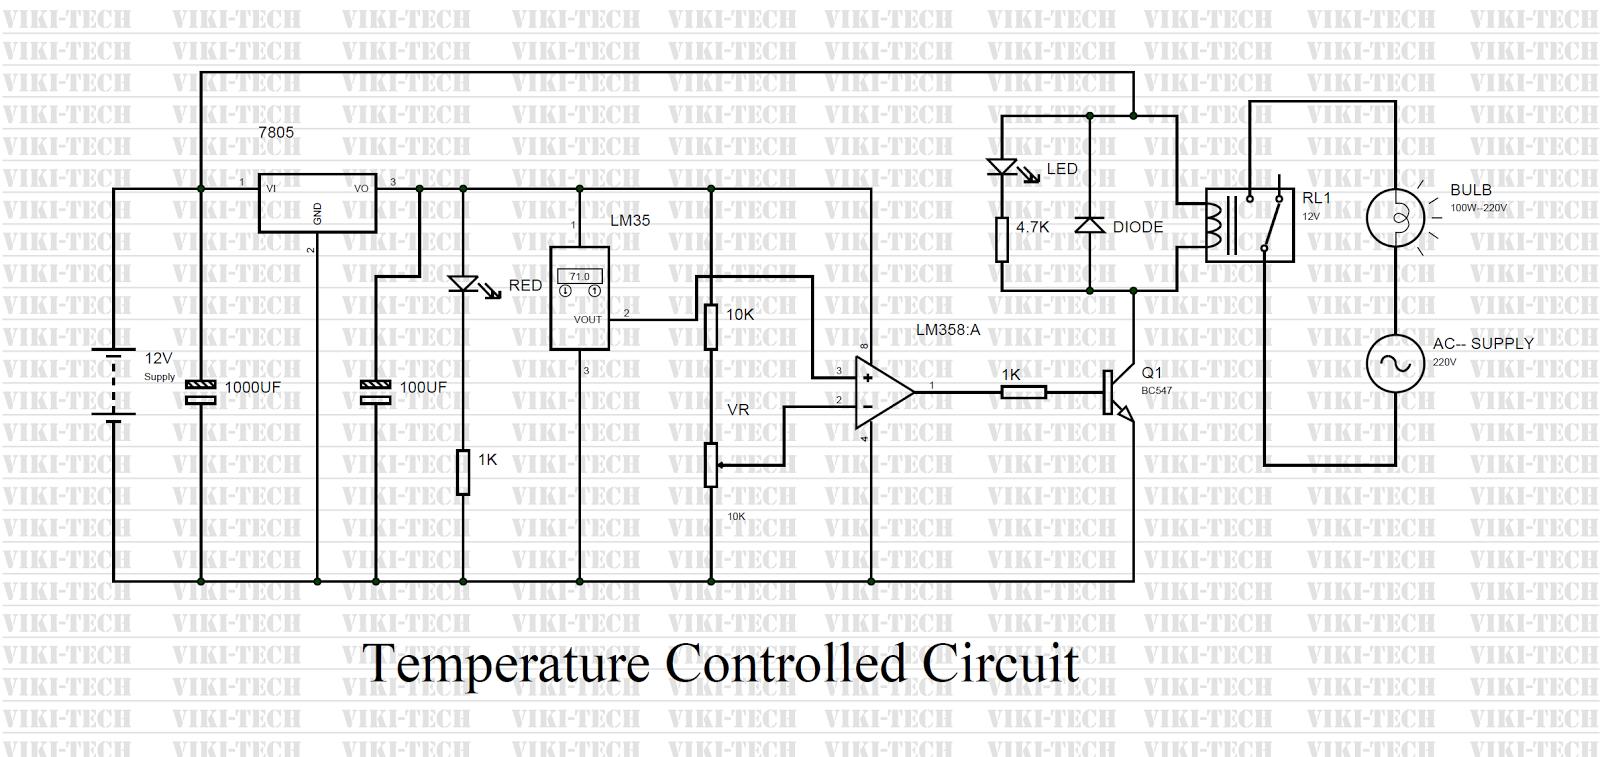 hight resolution of temperature controlled circuit diagram